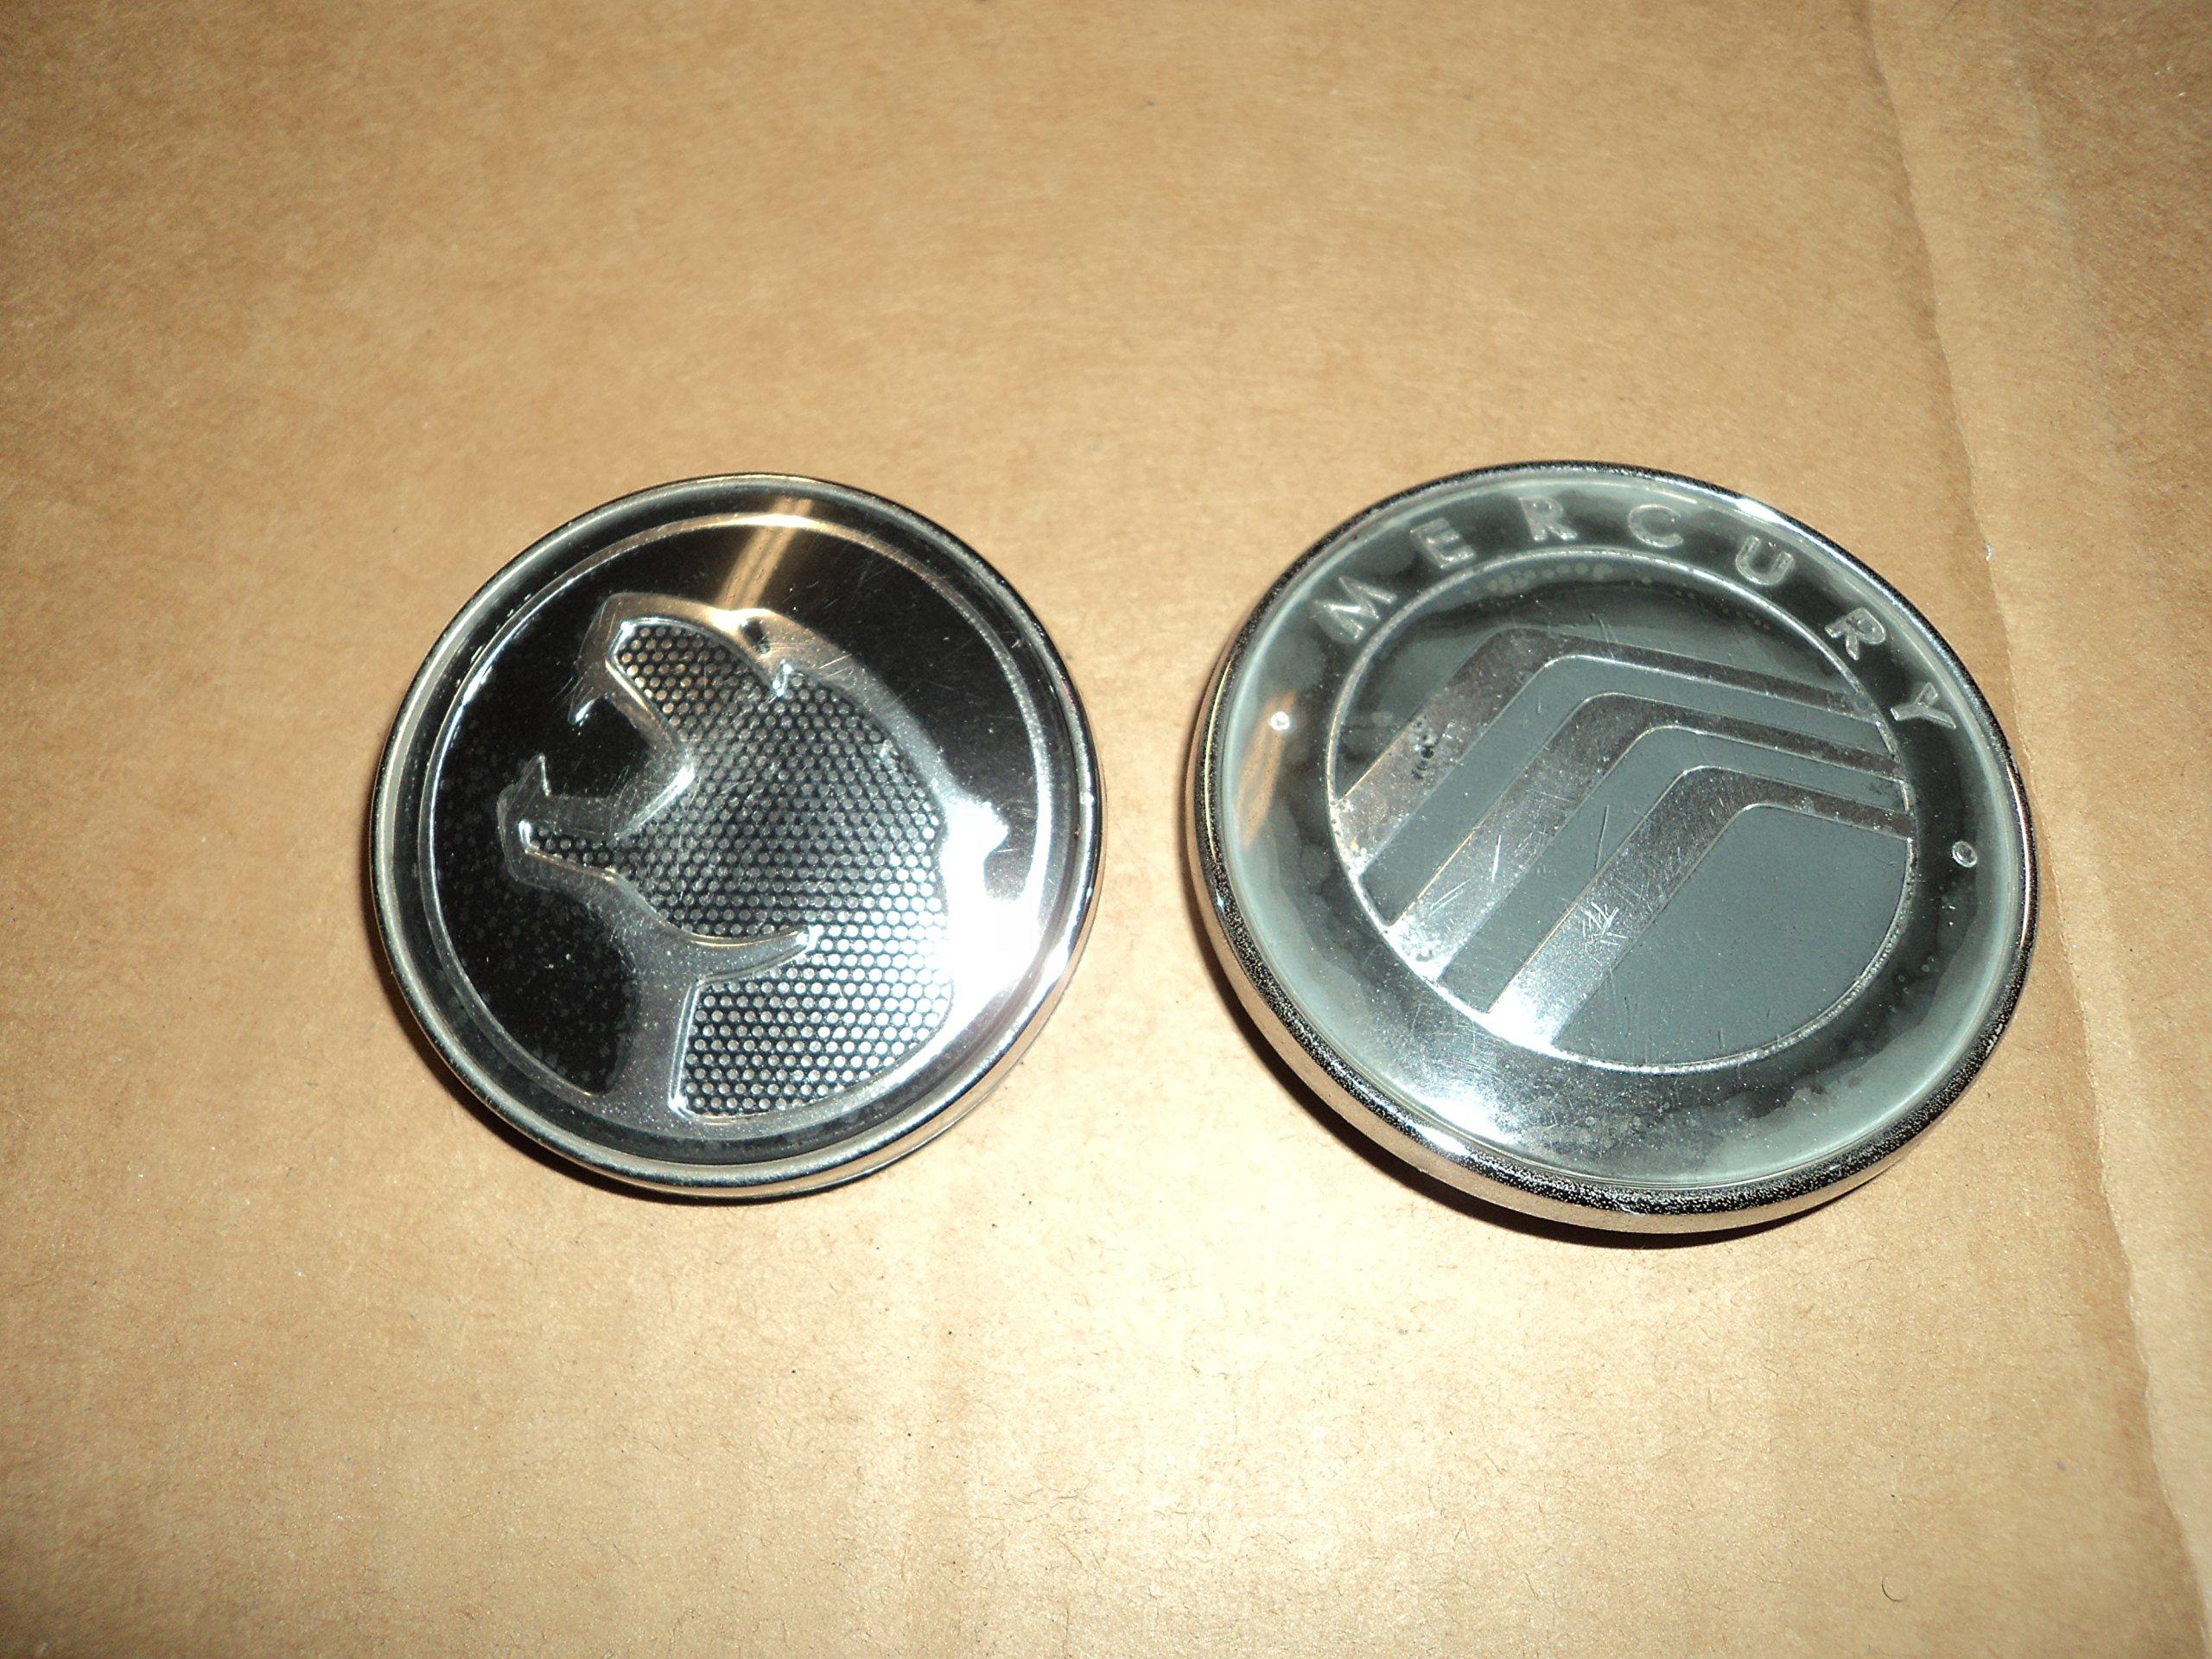 72457bbb4a6 Get Quotations · 99 00 Mercury Cougar Grille Tailgate Roundel Emblem  98BG-CA2528-AD Ornament Logo Symbol